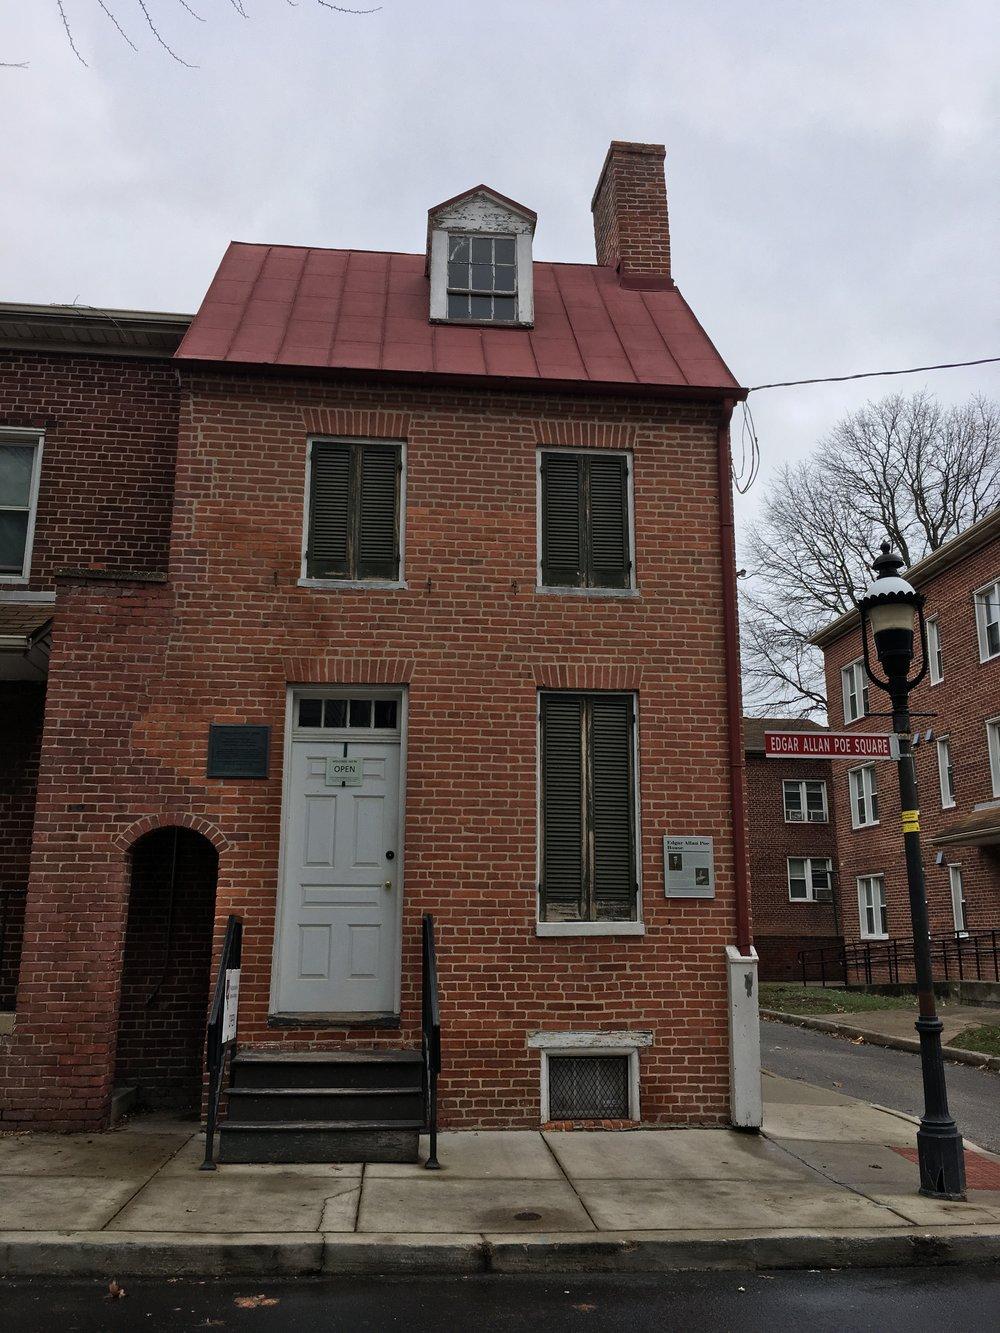 Poe House Baltimore